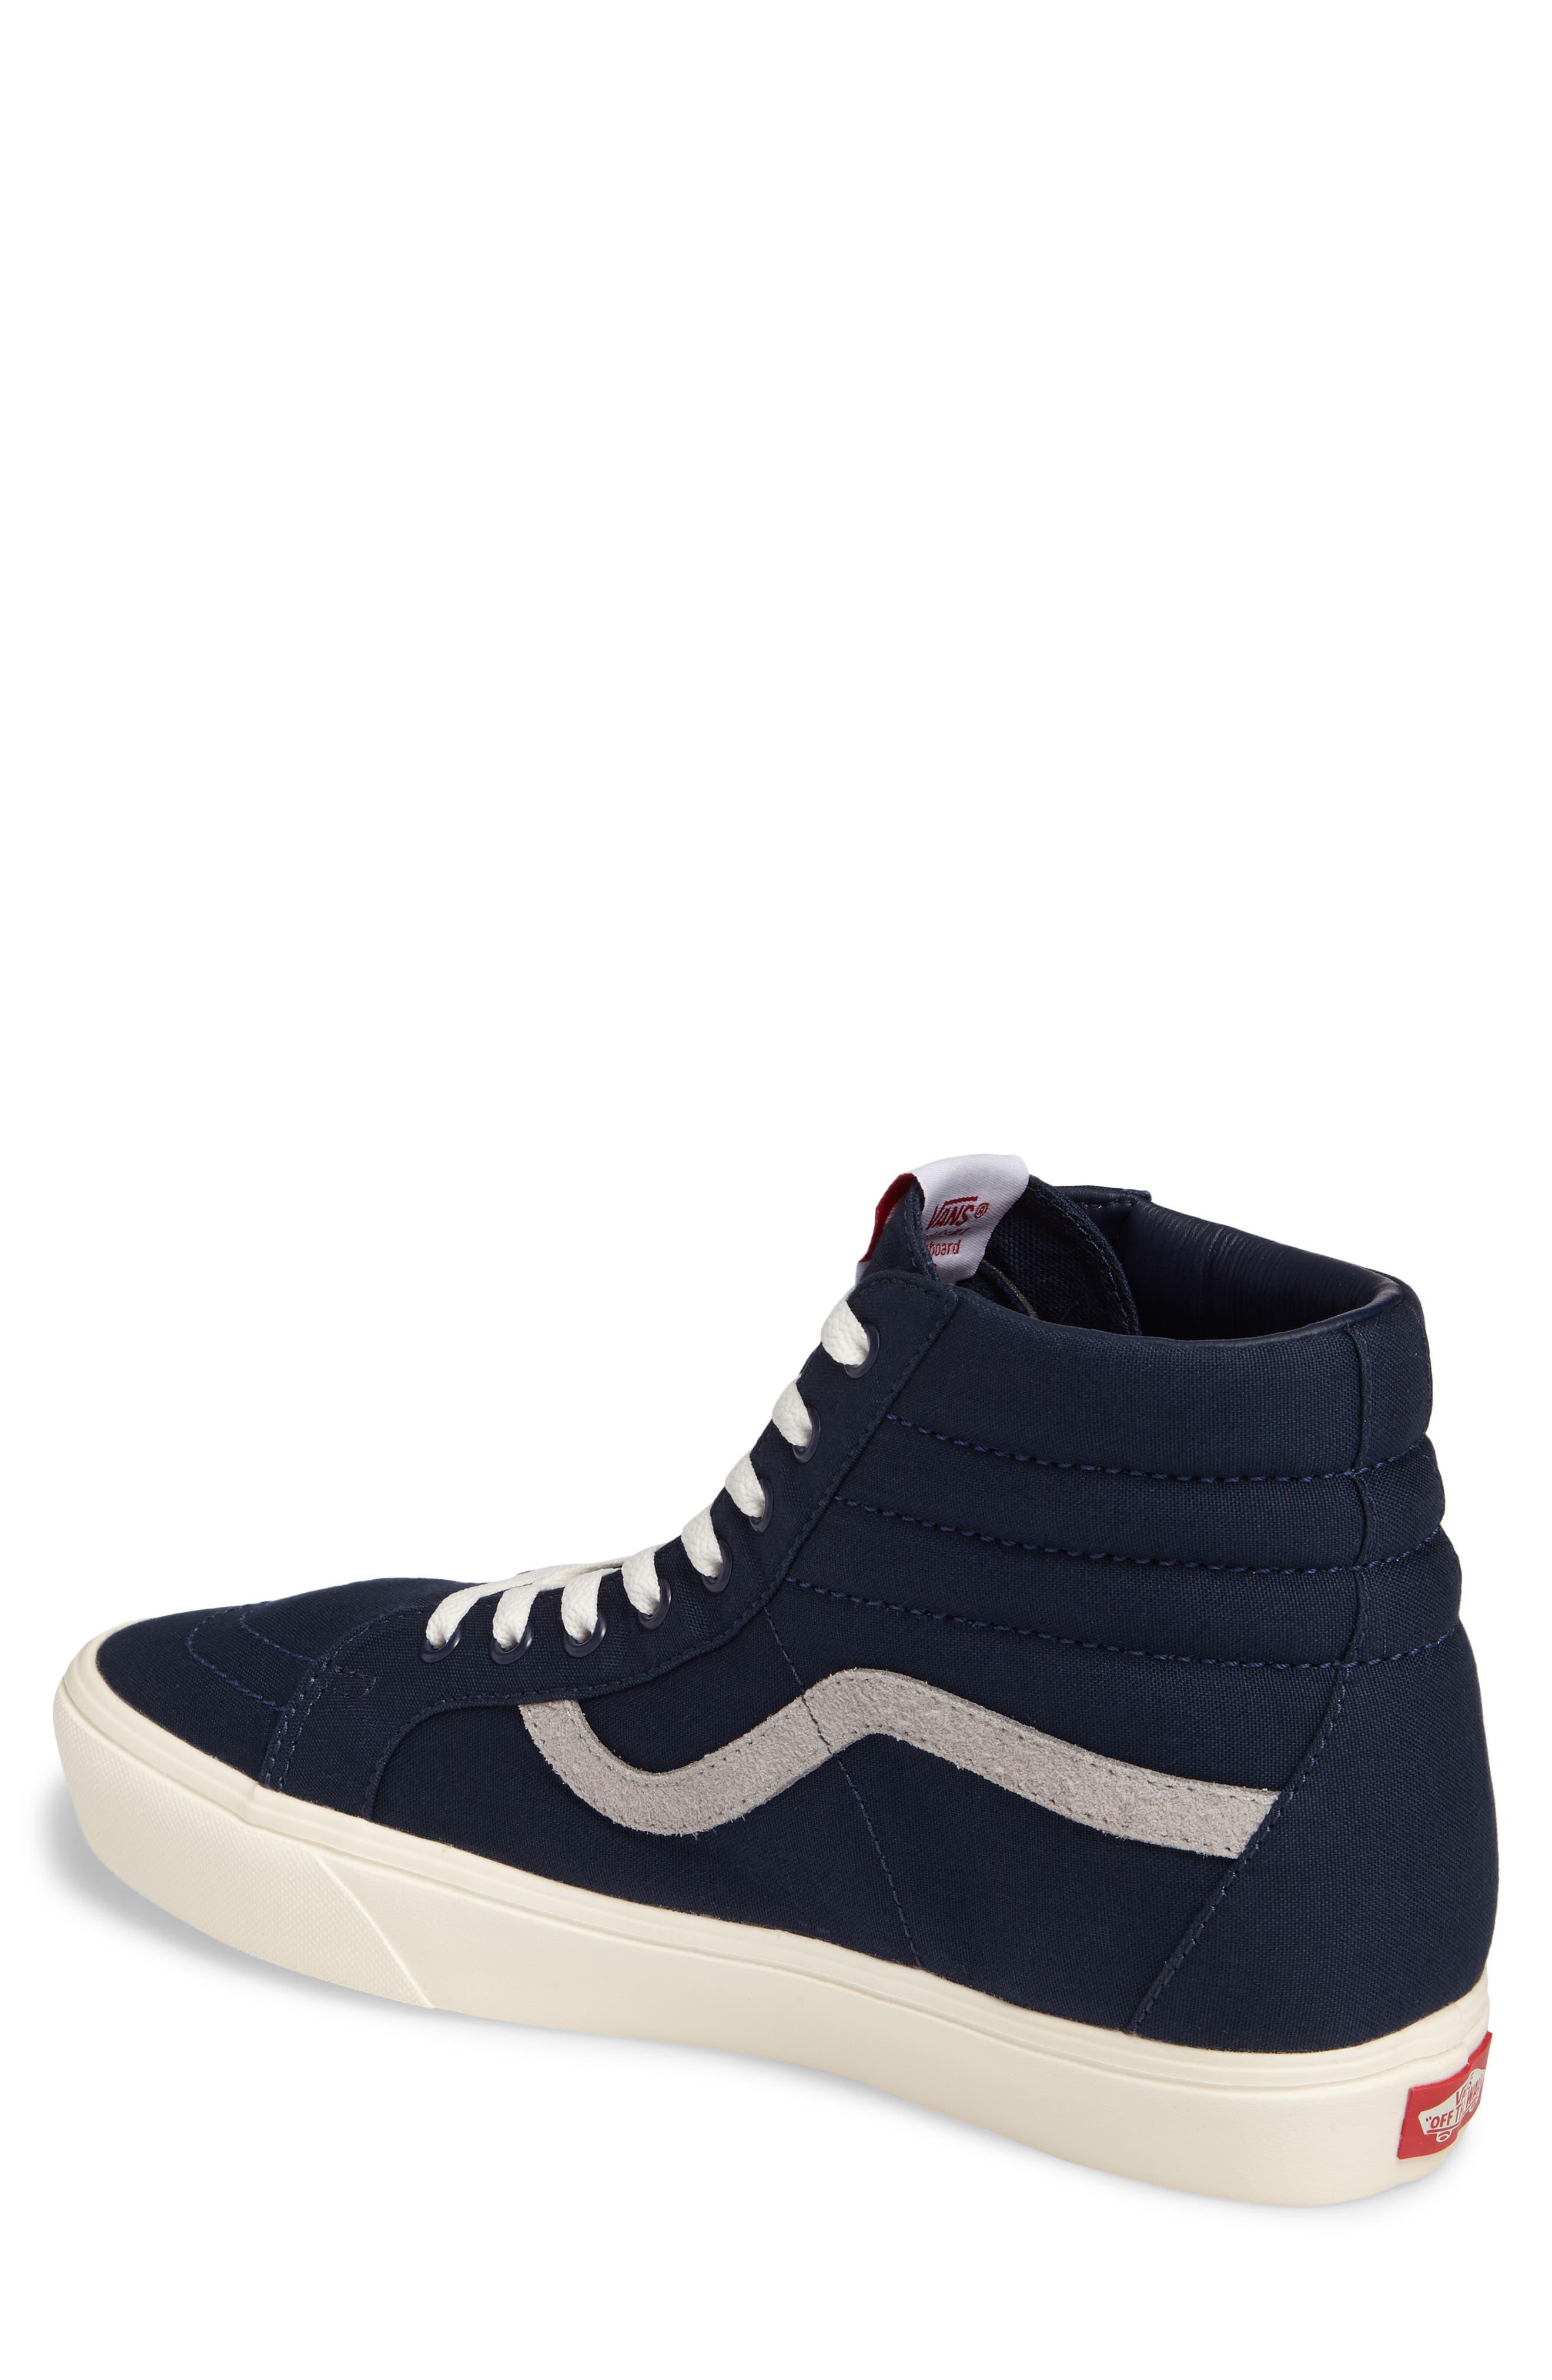 Sk80-Hi Reissue Lite Sneaker,                             Alternate thumbnail 2, color,                             Dress Blues/Marshmallow Canvas